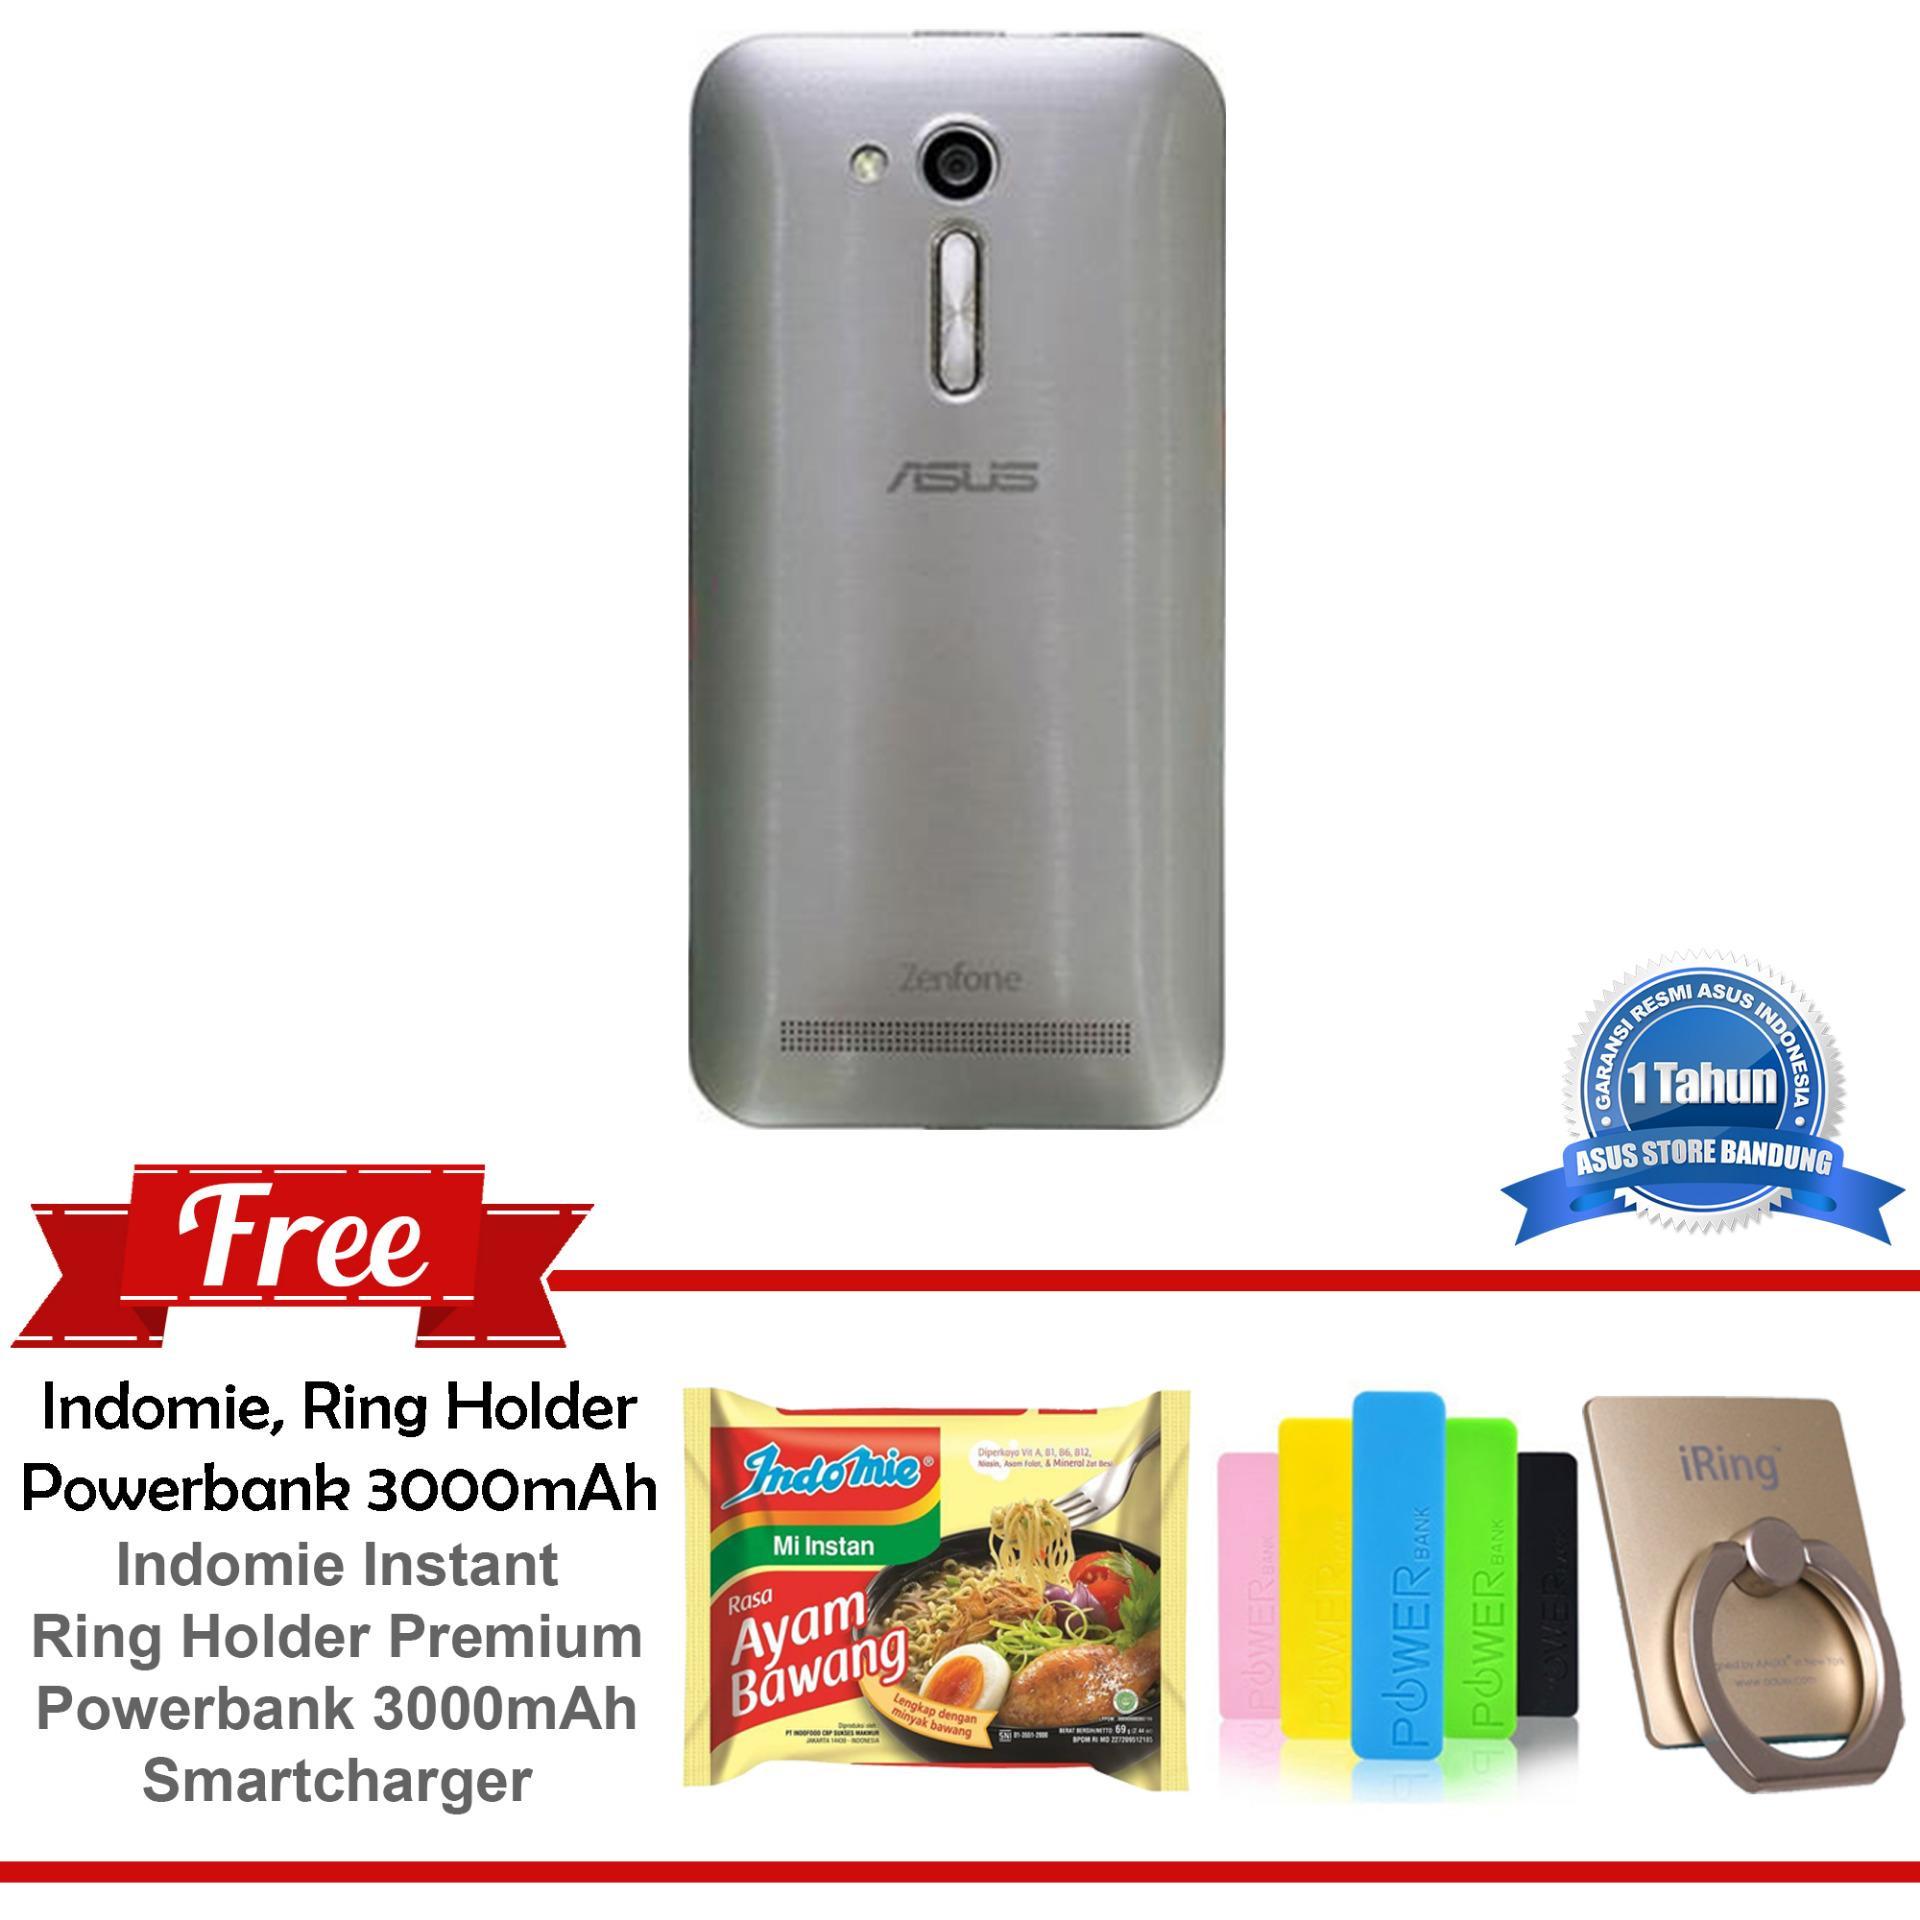 Anggaran Terbaik Asus Zenfone Go Zb450kl 4g Lte Free Indomie Xiaomi Redmi 4a Garansi Resmi 1 Tahun Powerbank Ring Holder